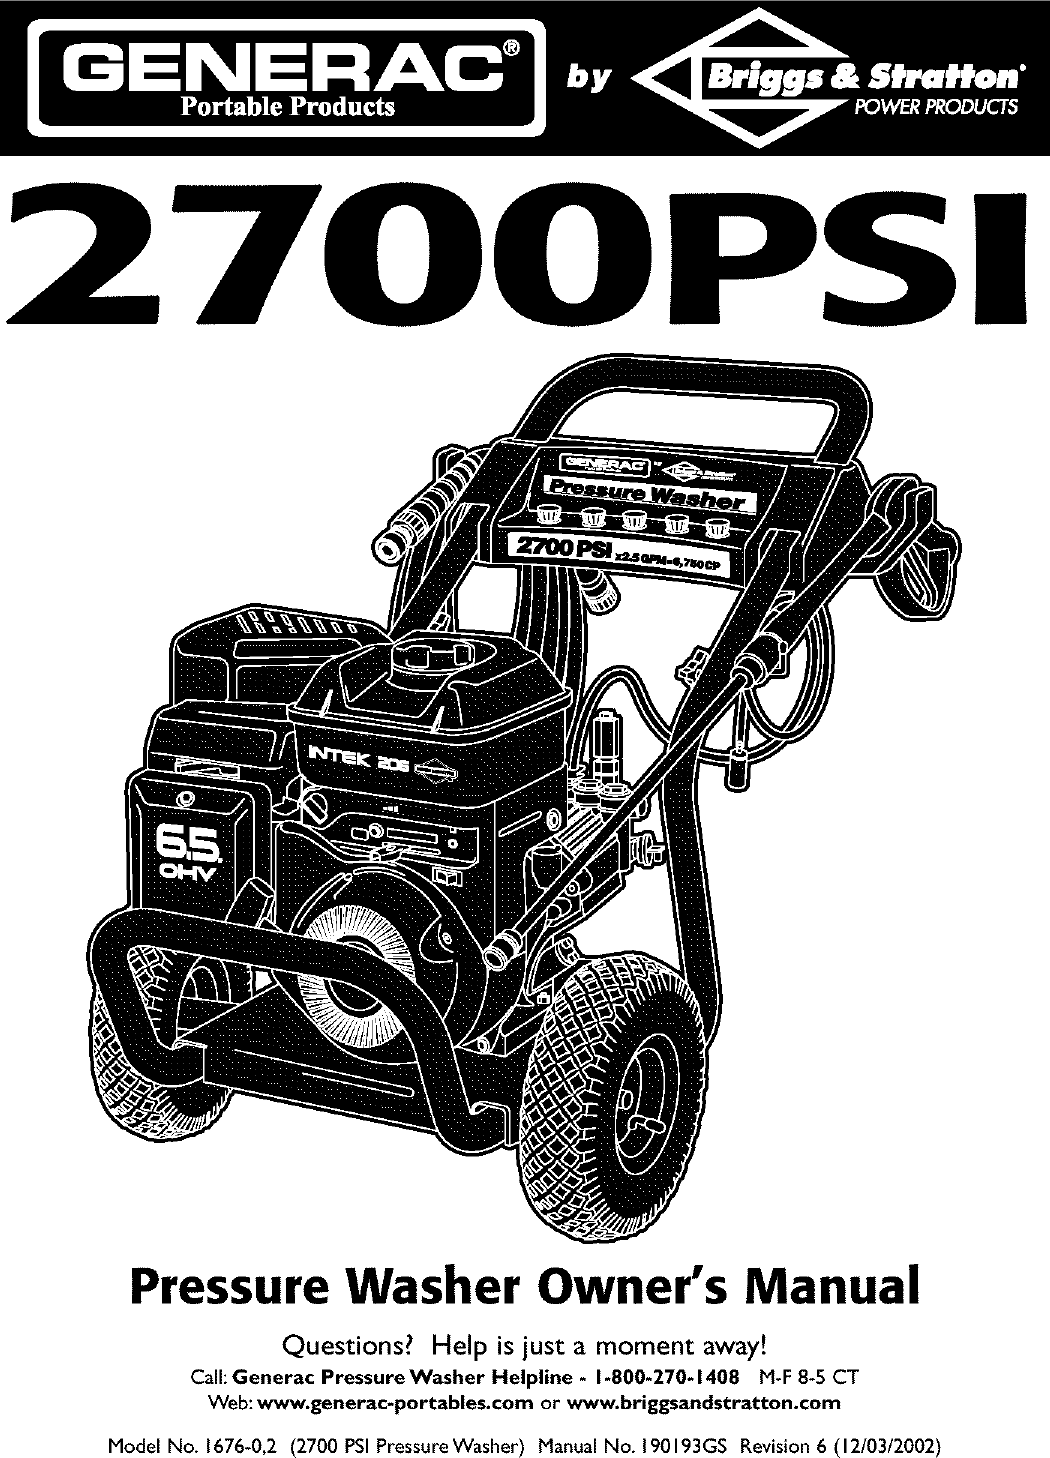 Generac 1676 0 User Manual PRESSURE WASHER Manuals And